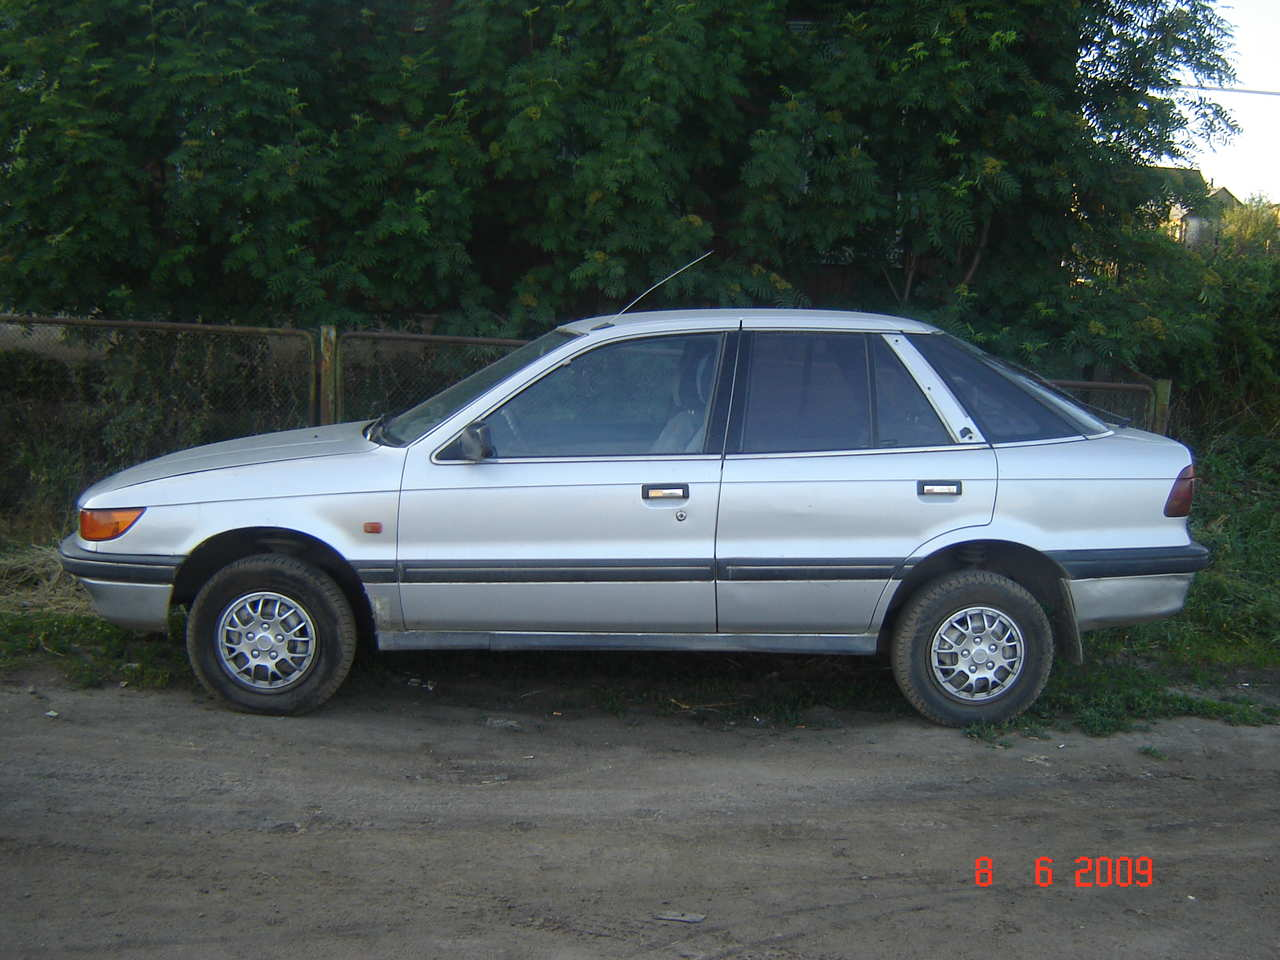 1990 Mitsubishi Lancer Pics, Gasoline, FF, Manual For Sale